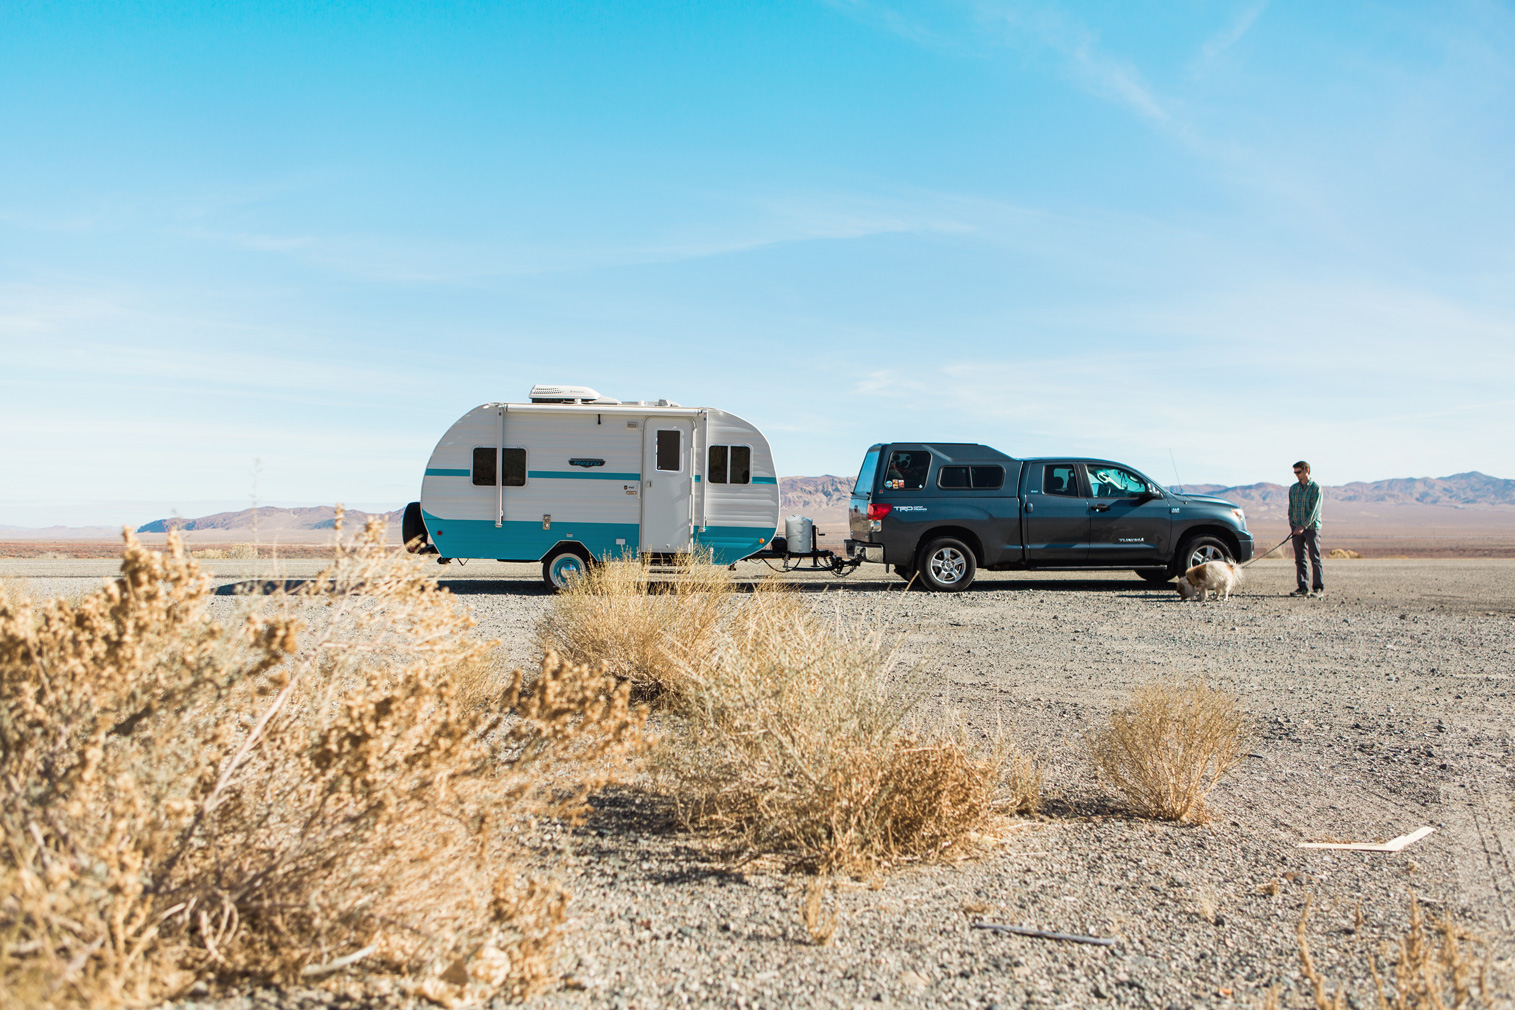 CindyGiovagnoli_Nevada_Arizona_roadtrip_sunset_travel_camper_tinyhouse-006.jpg